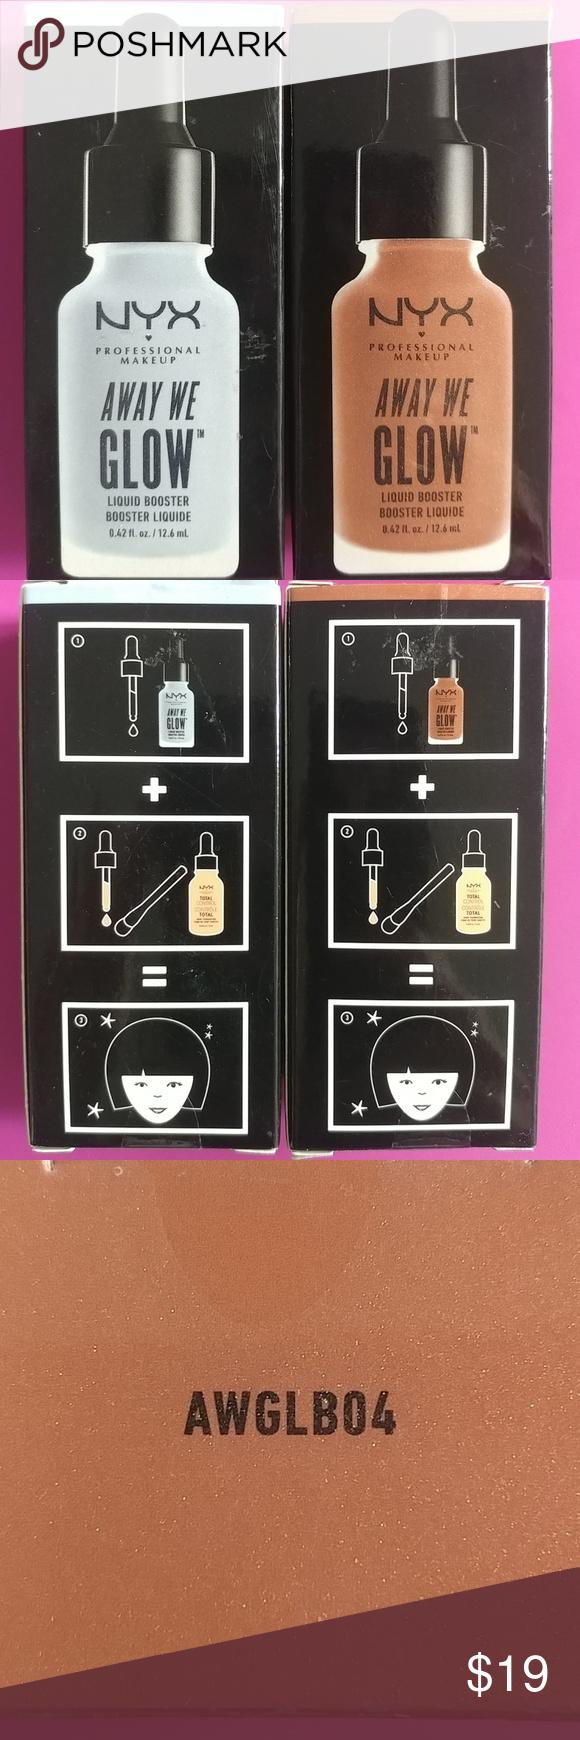 Nib Nyx Away We Glow Liquid Highlighter Luminizer Liquid Highlighter Nyx Away We Glow Perfume Bottles